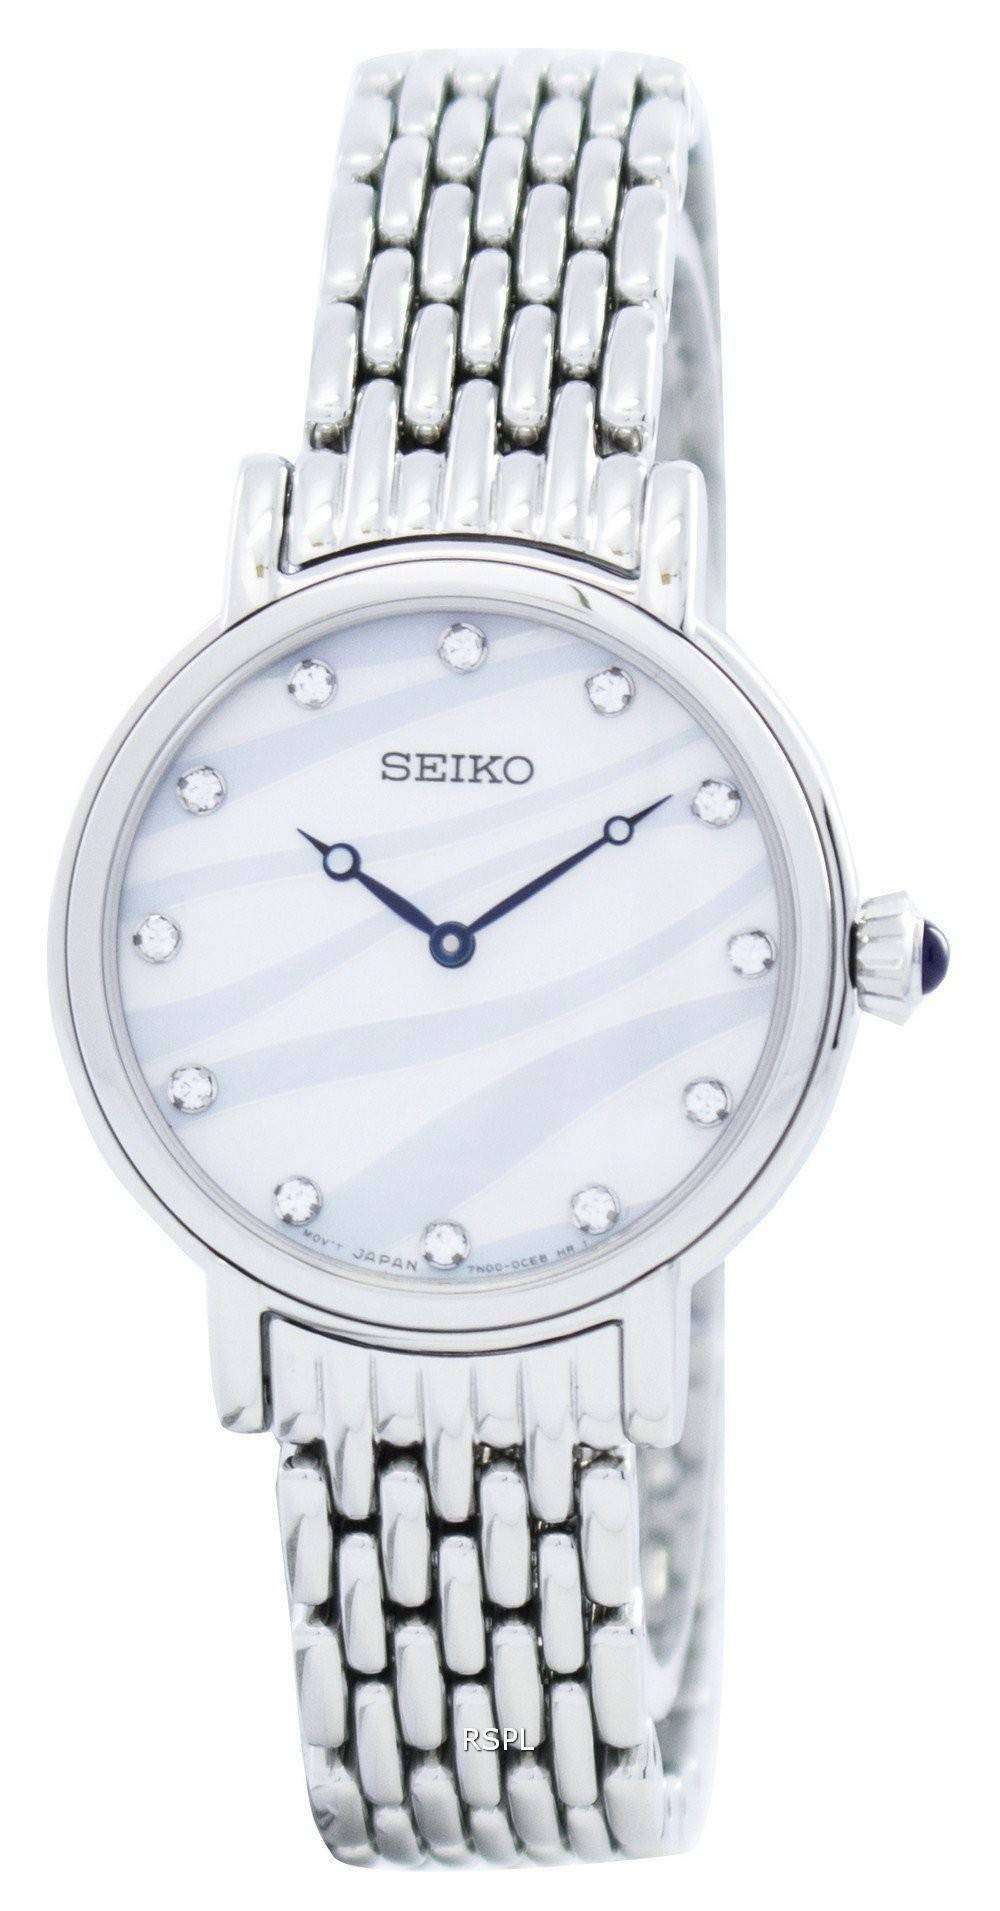 Seiko quartz swarovski crystals sfq807 sfq807p1 sfq807p women 39 s watch for Swarovski crystals watch